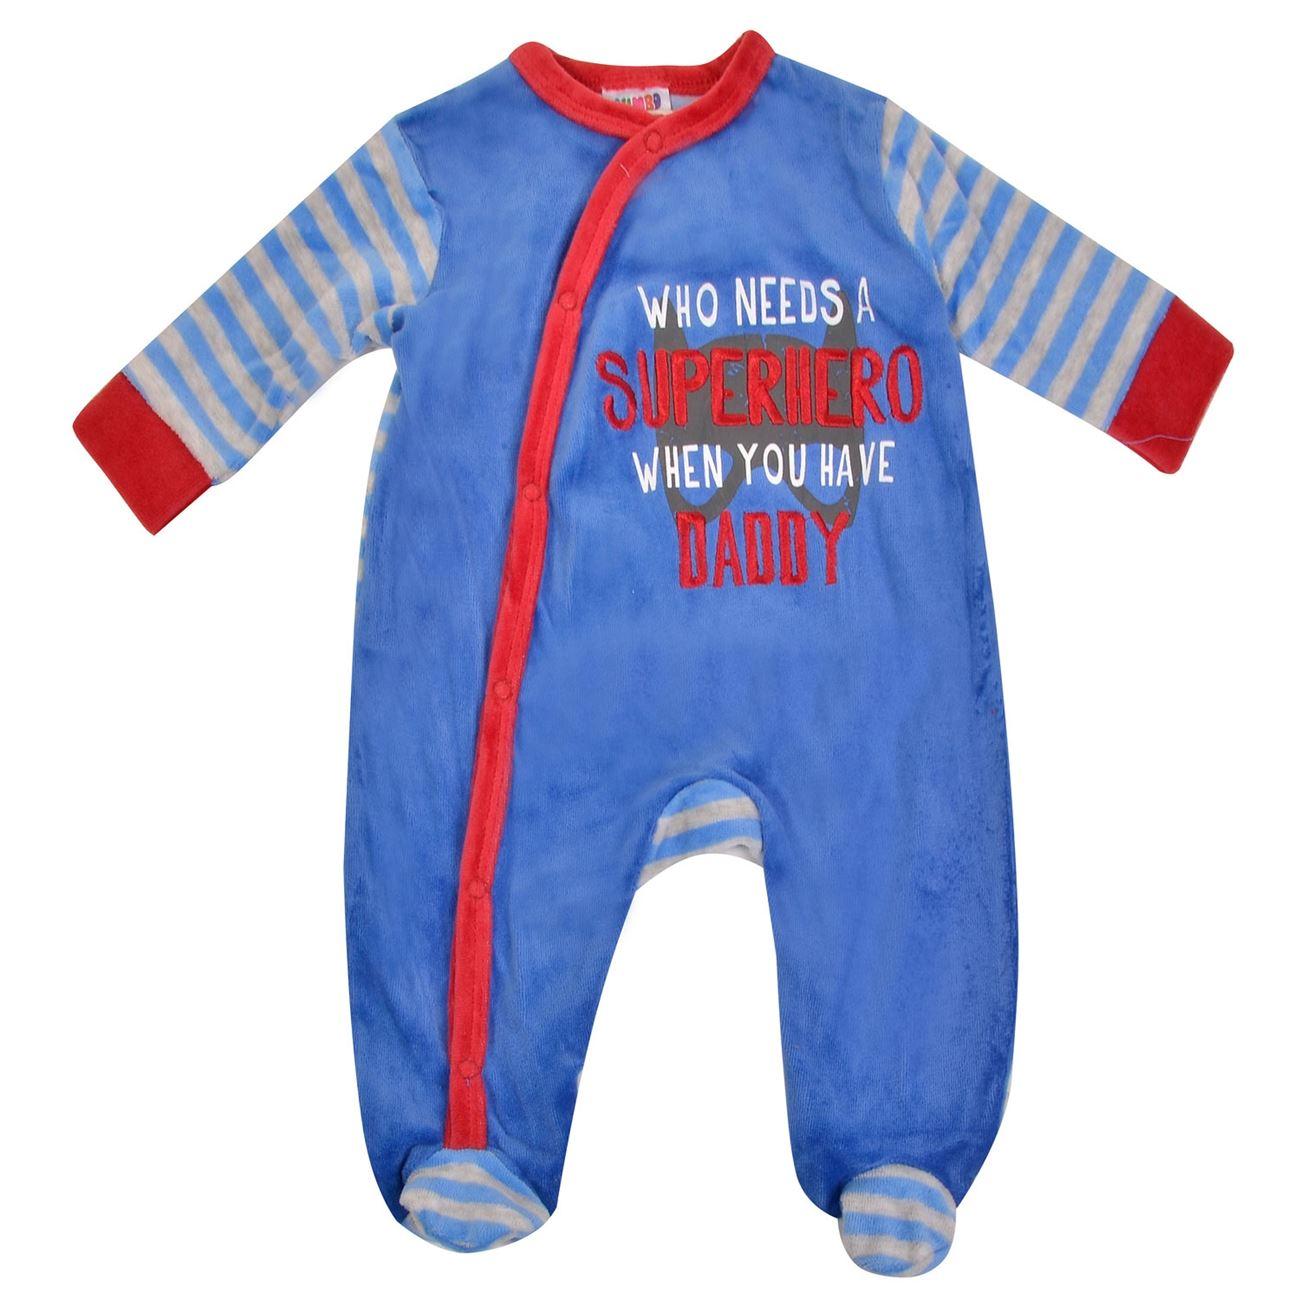 02201ad4ada Φορμάκι Βρεφικό Βελουτέ Μπλε < Φορμάκια Βελουτέ Fleece για Αγόρια ...